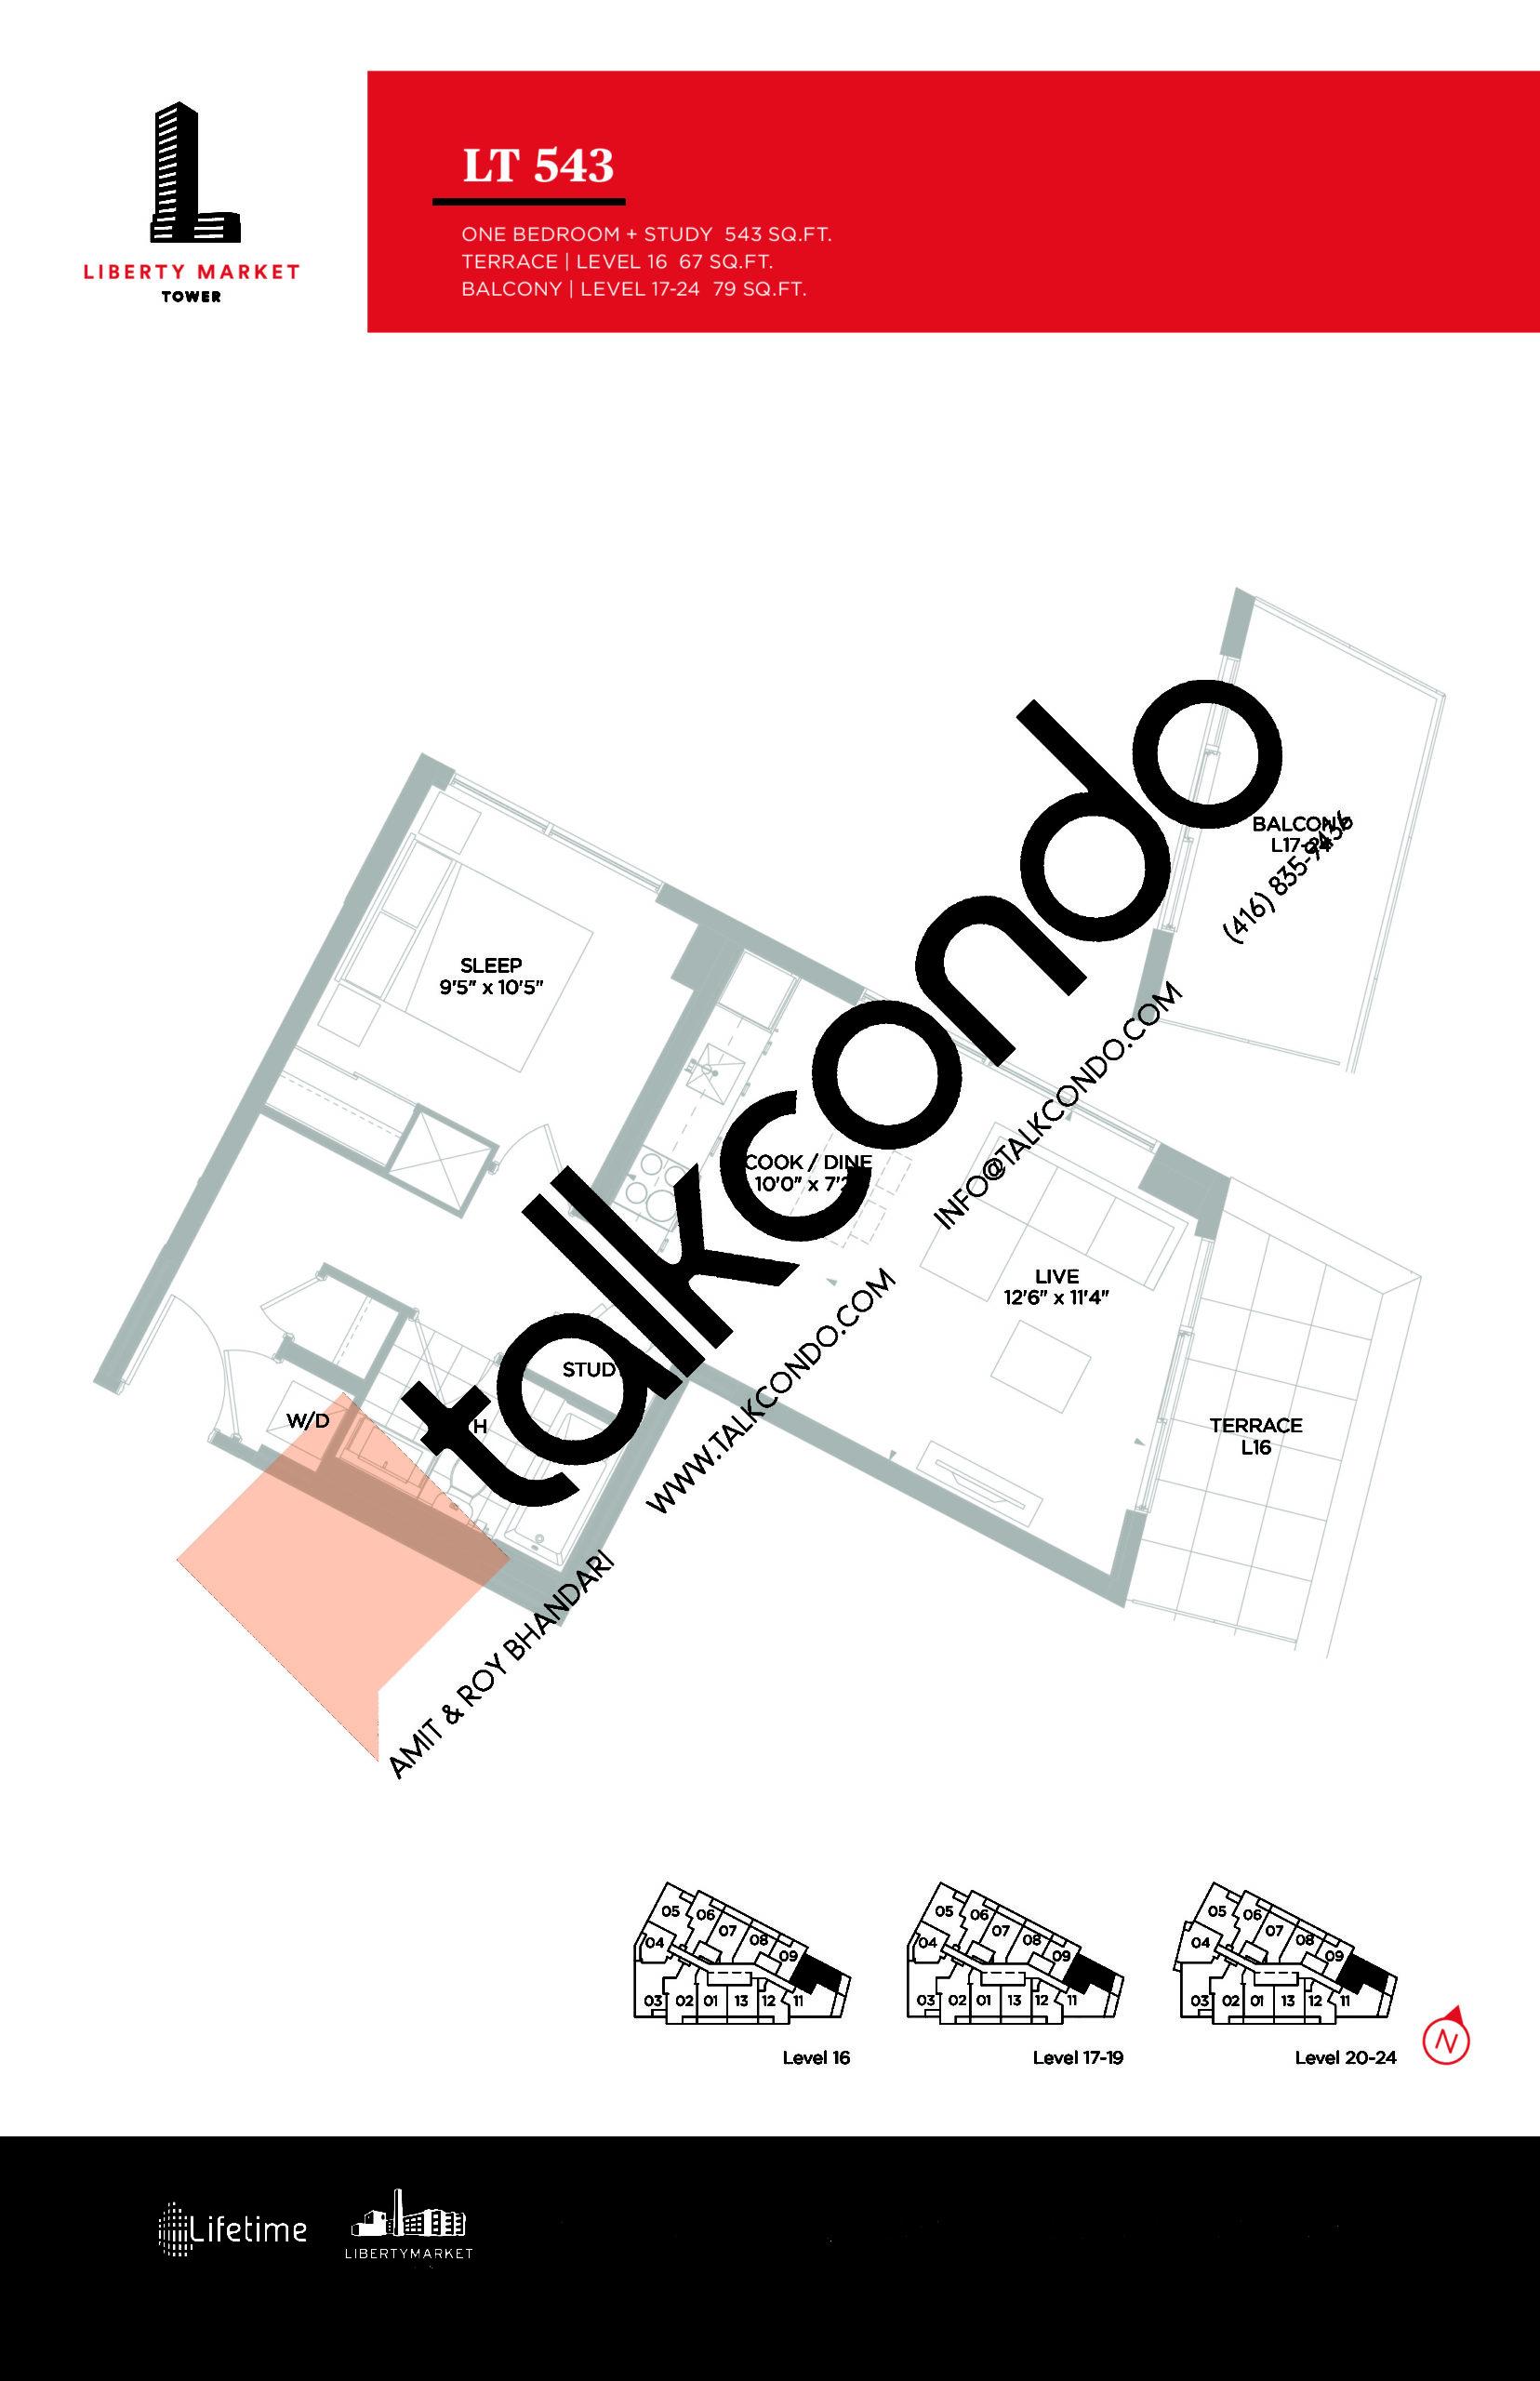 LT 543 Floor Plan at Liberty Market Tower Condos - 543 sq.ft